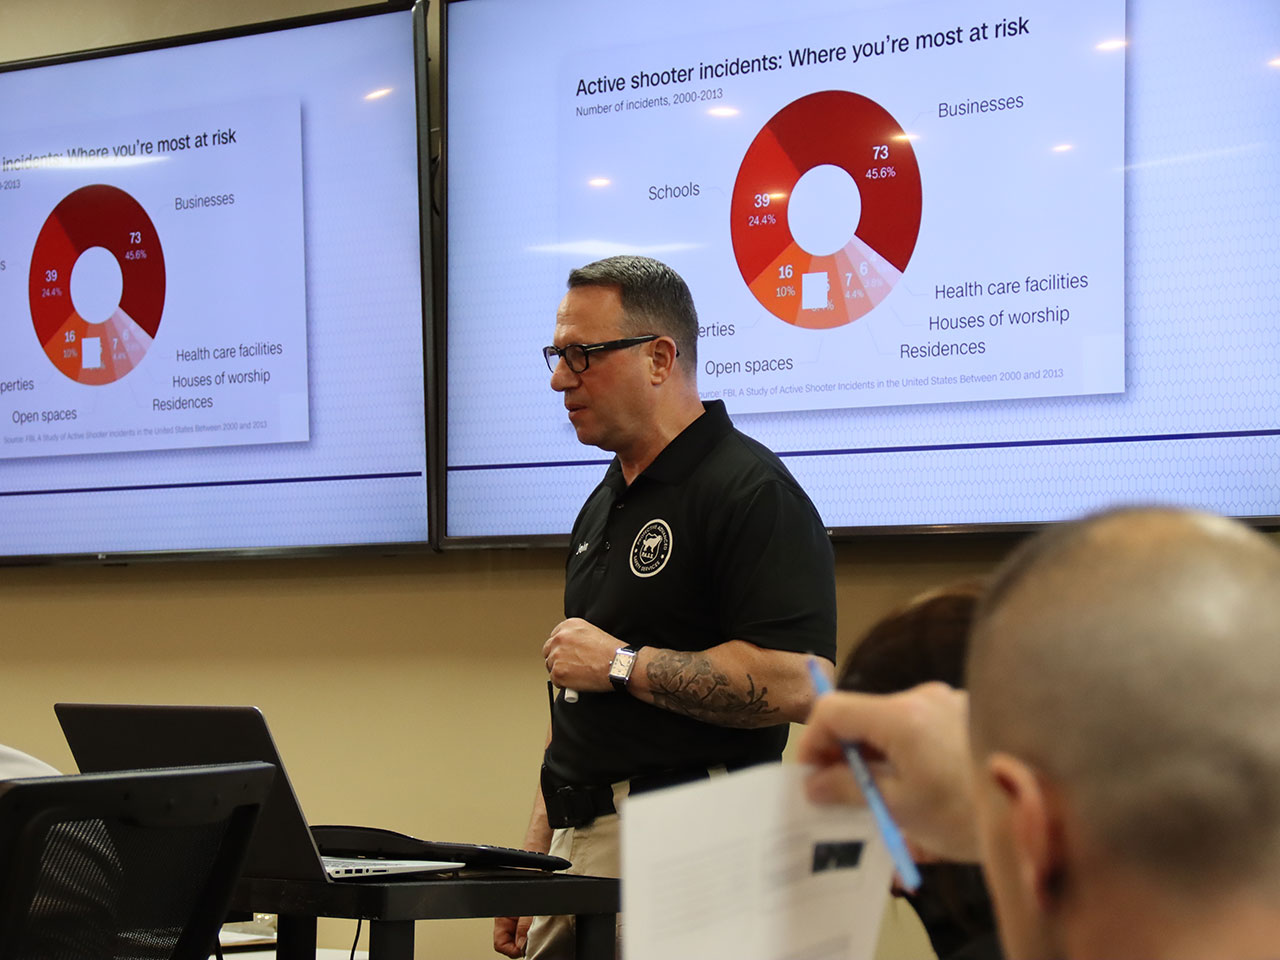 PASS talks as part of active shooter presentation